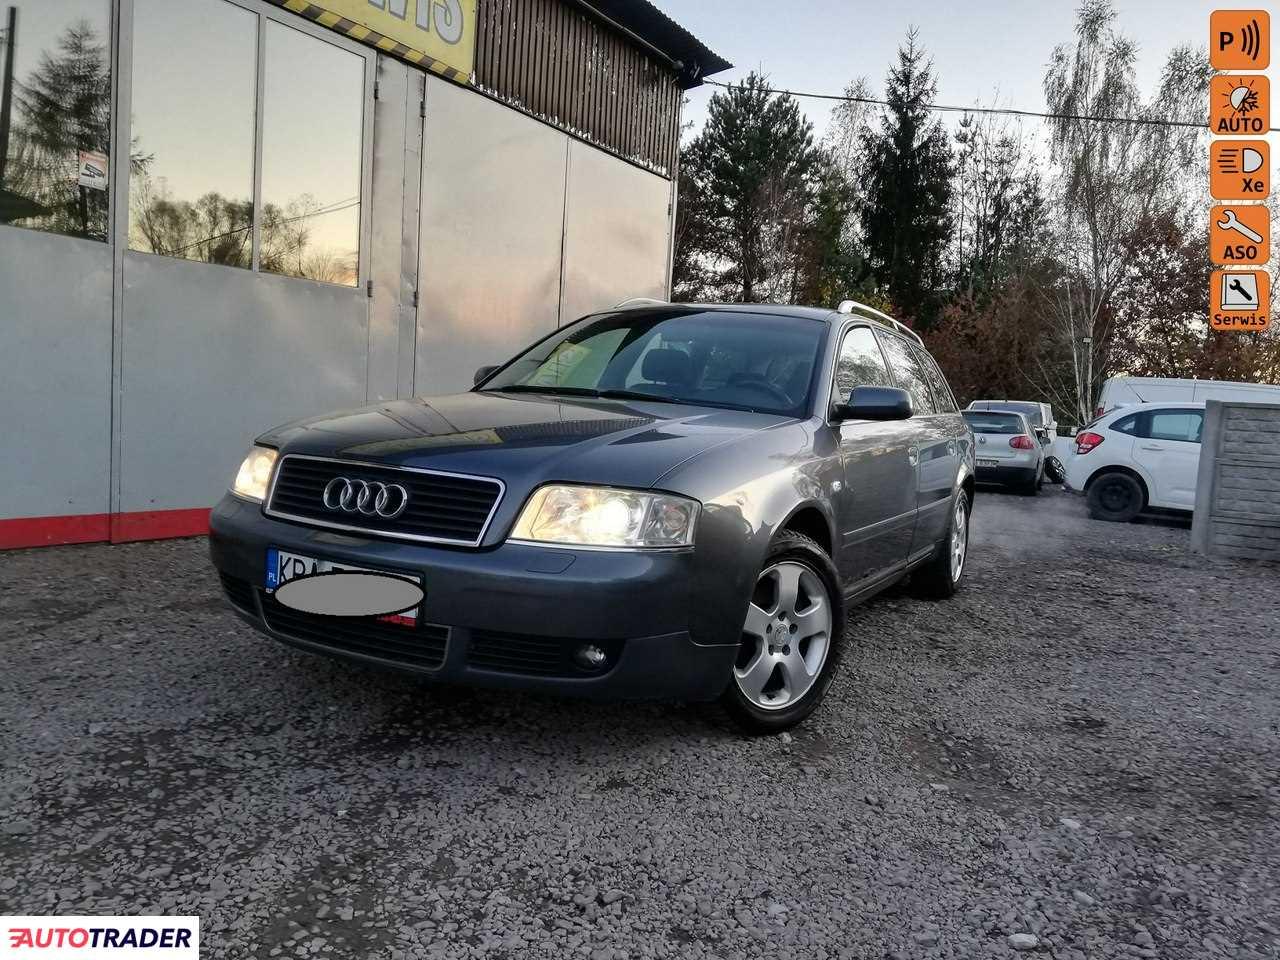 Audi A6 2002 2.0 129 KM